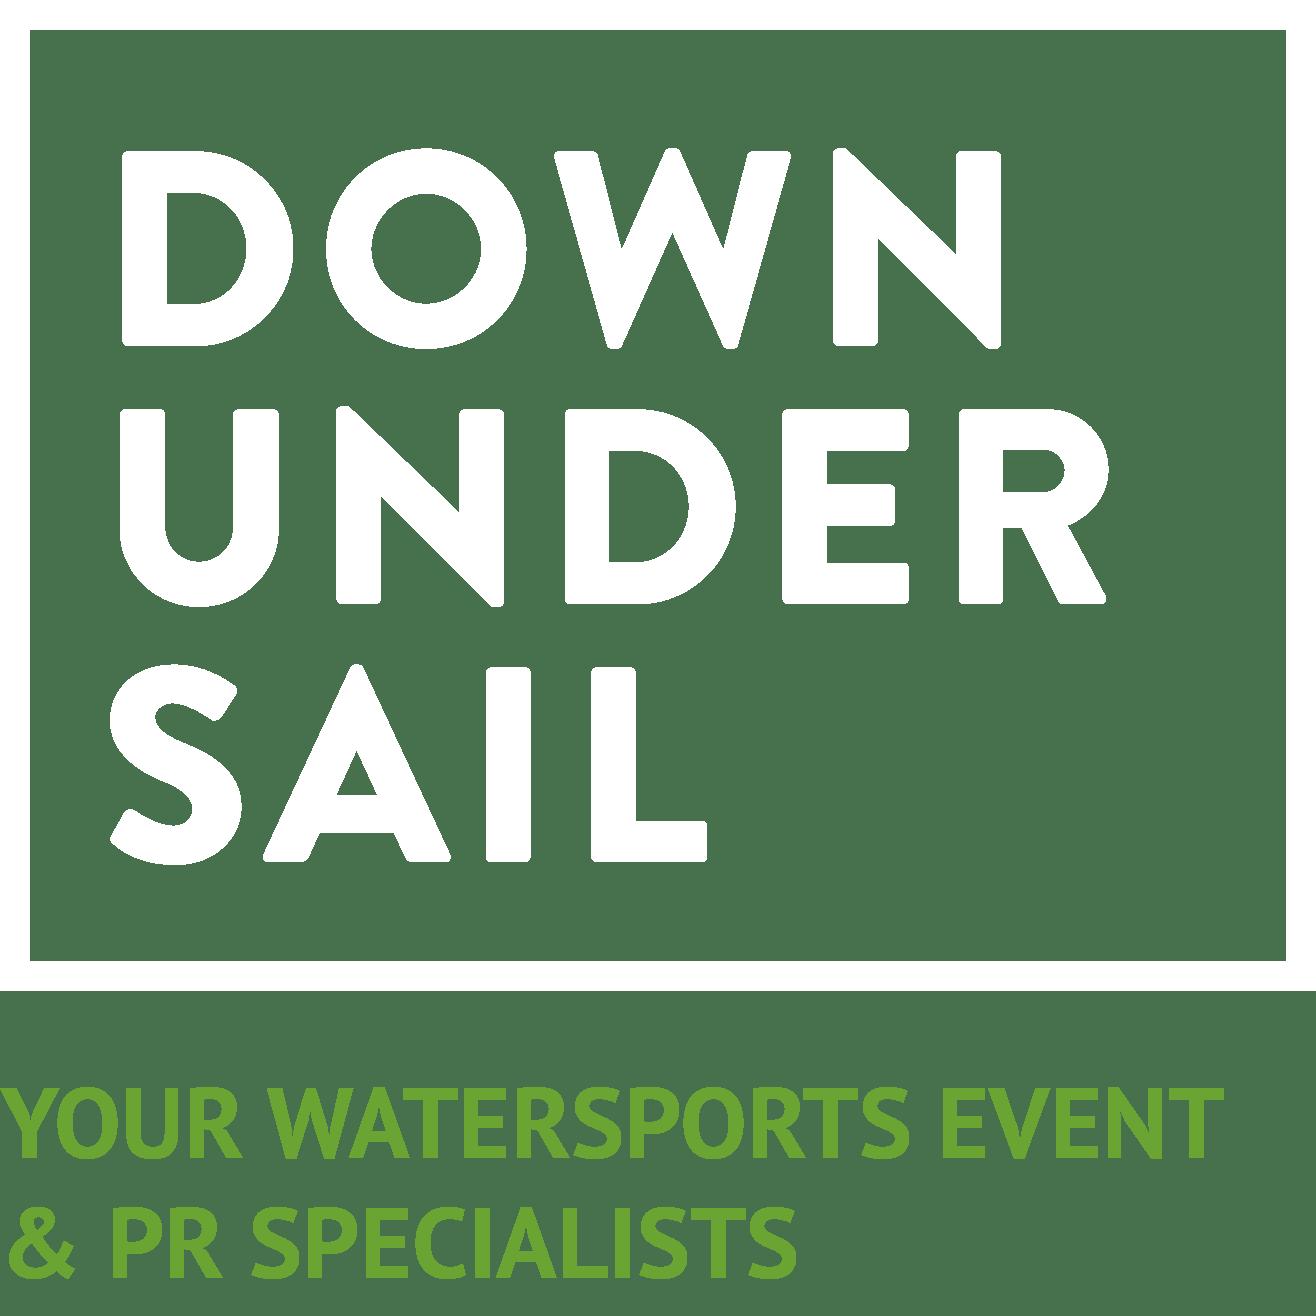 Down Under Sail